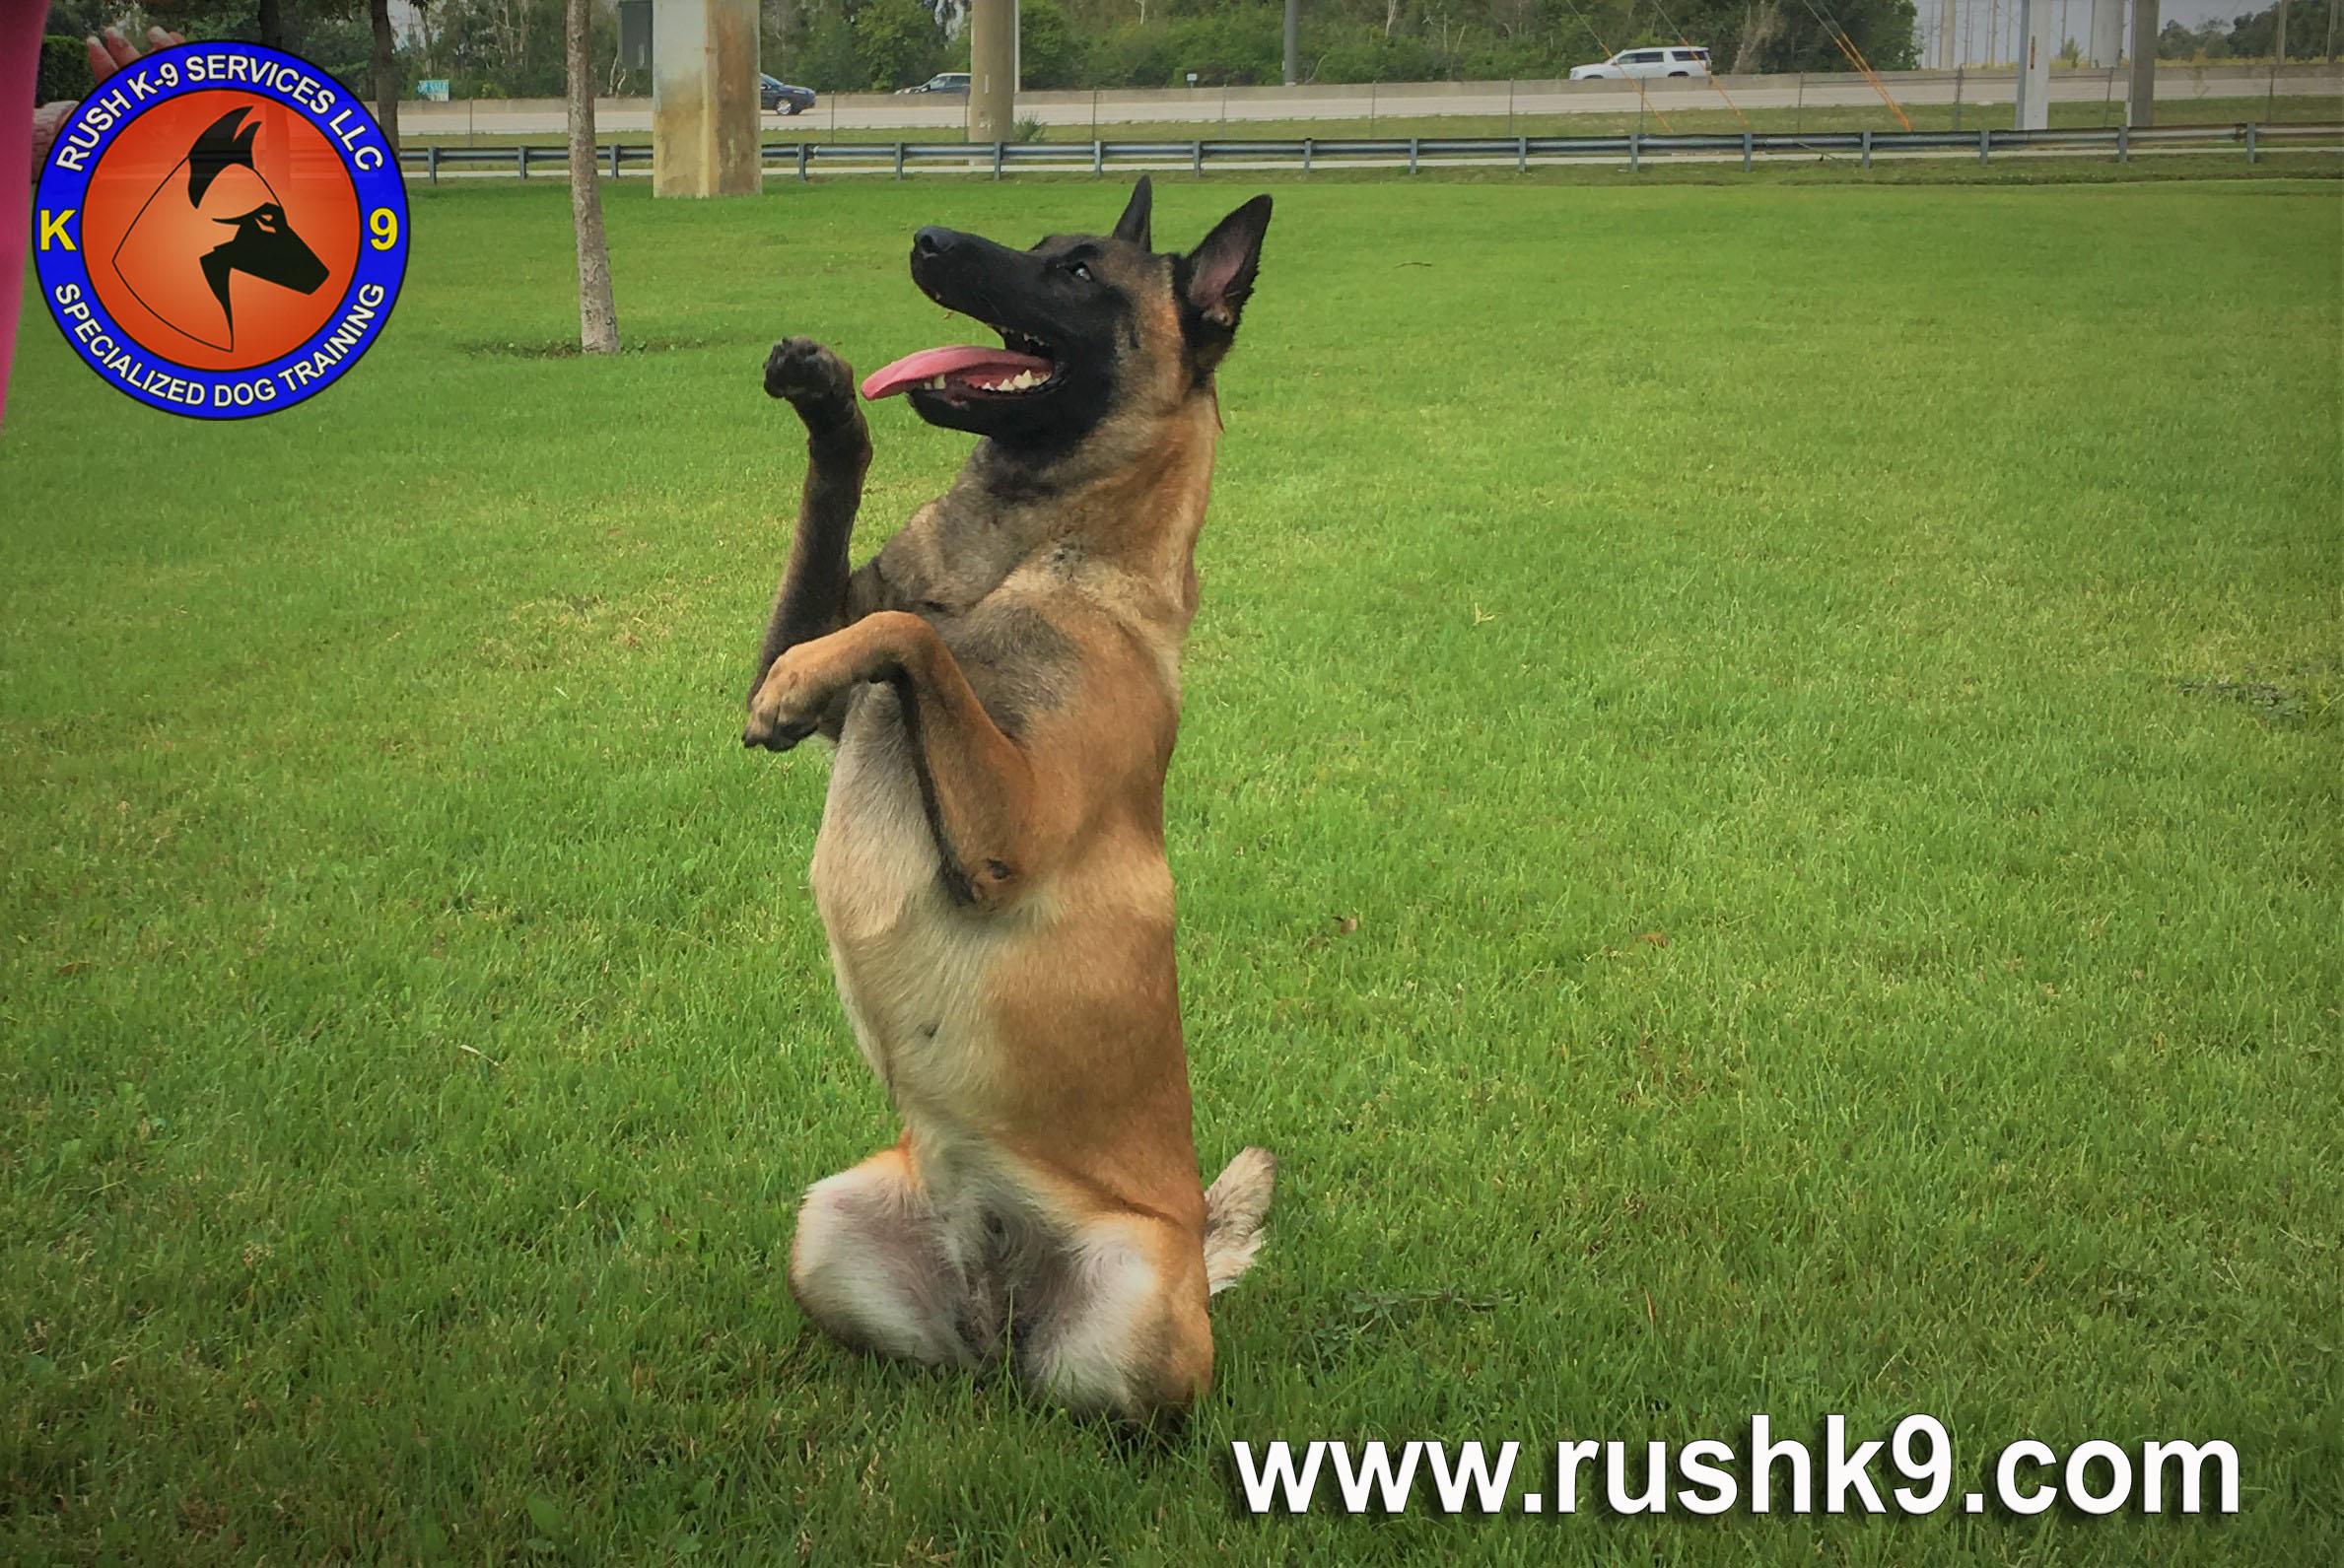 rush k9 services (33)